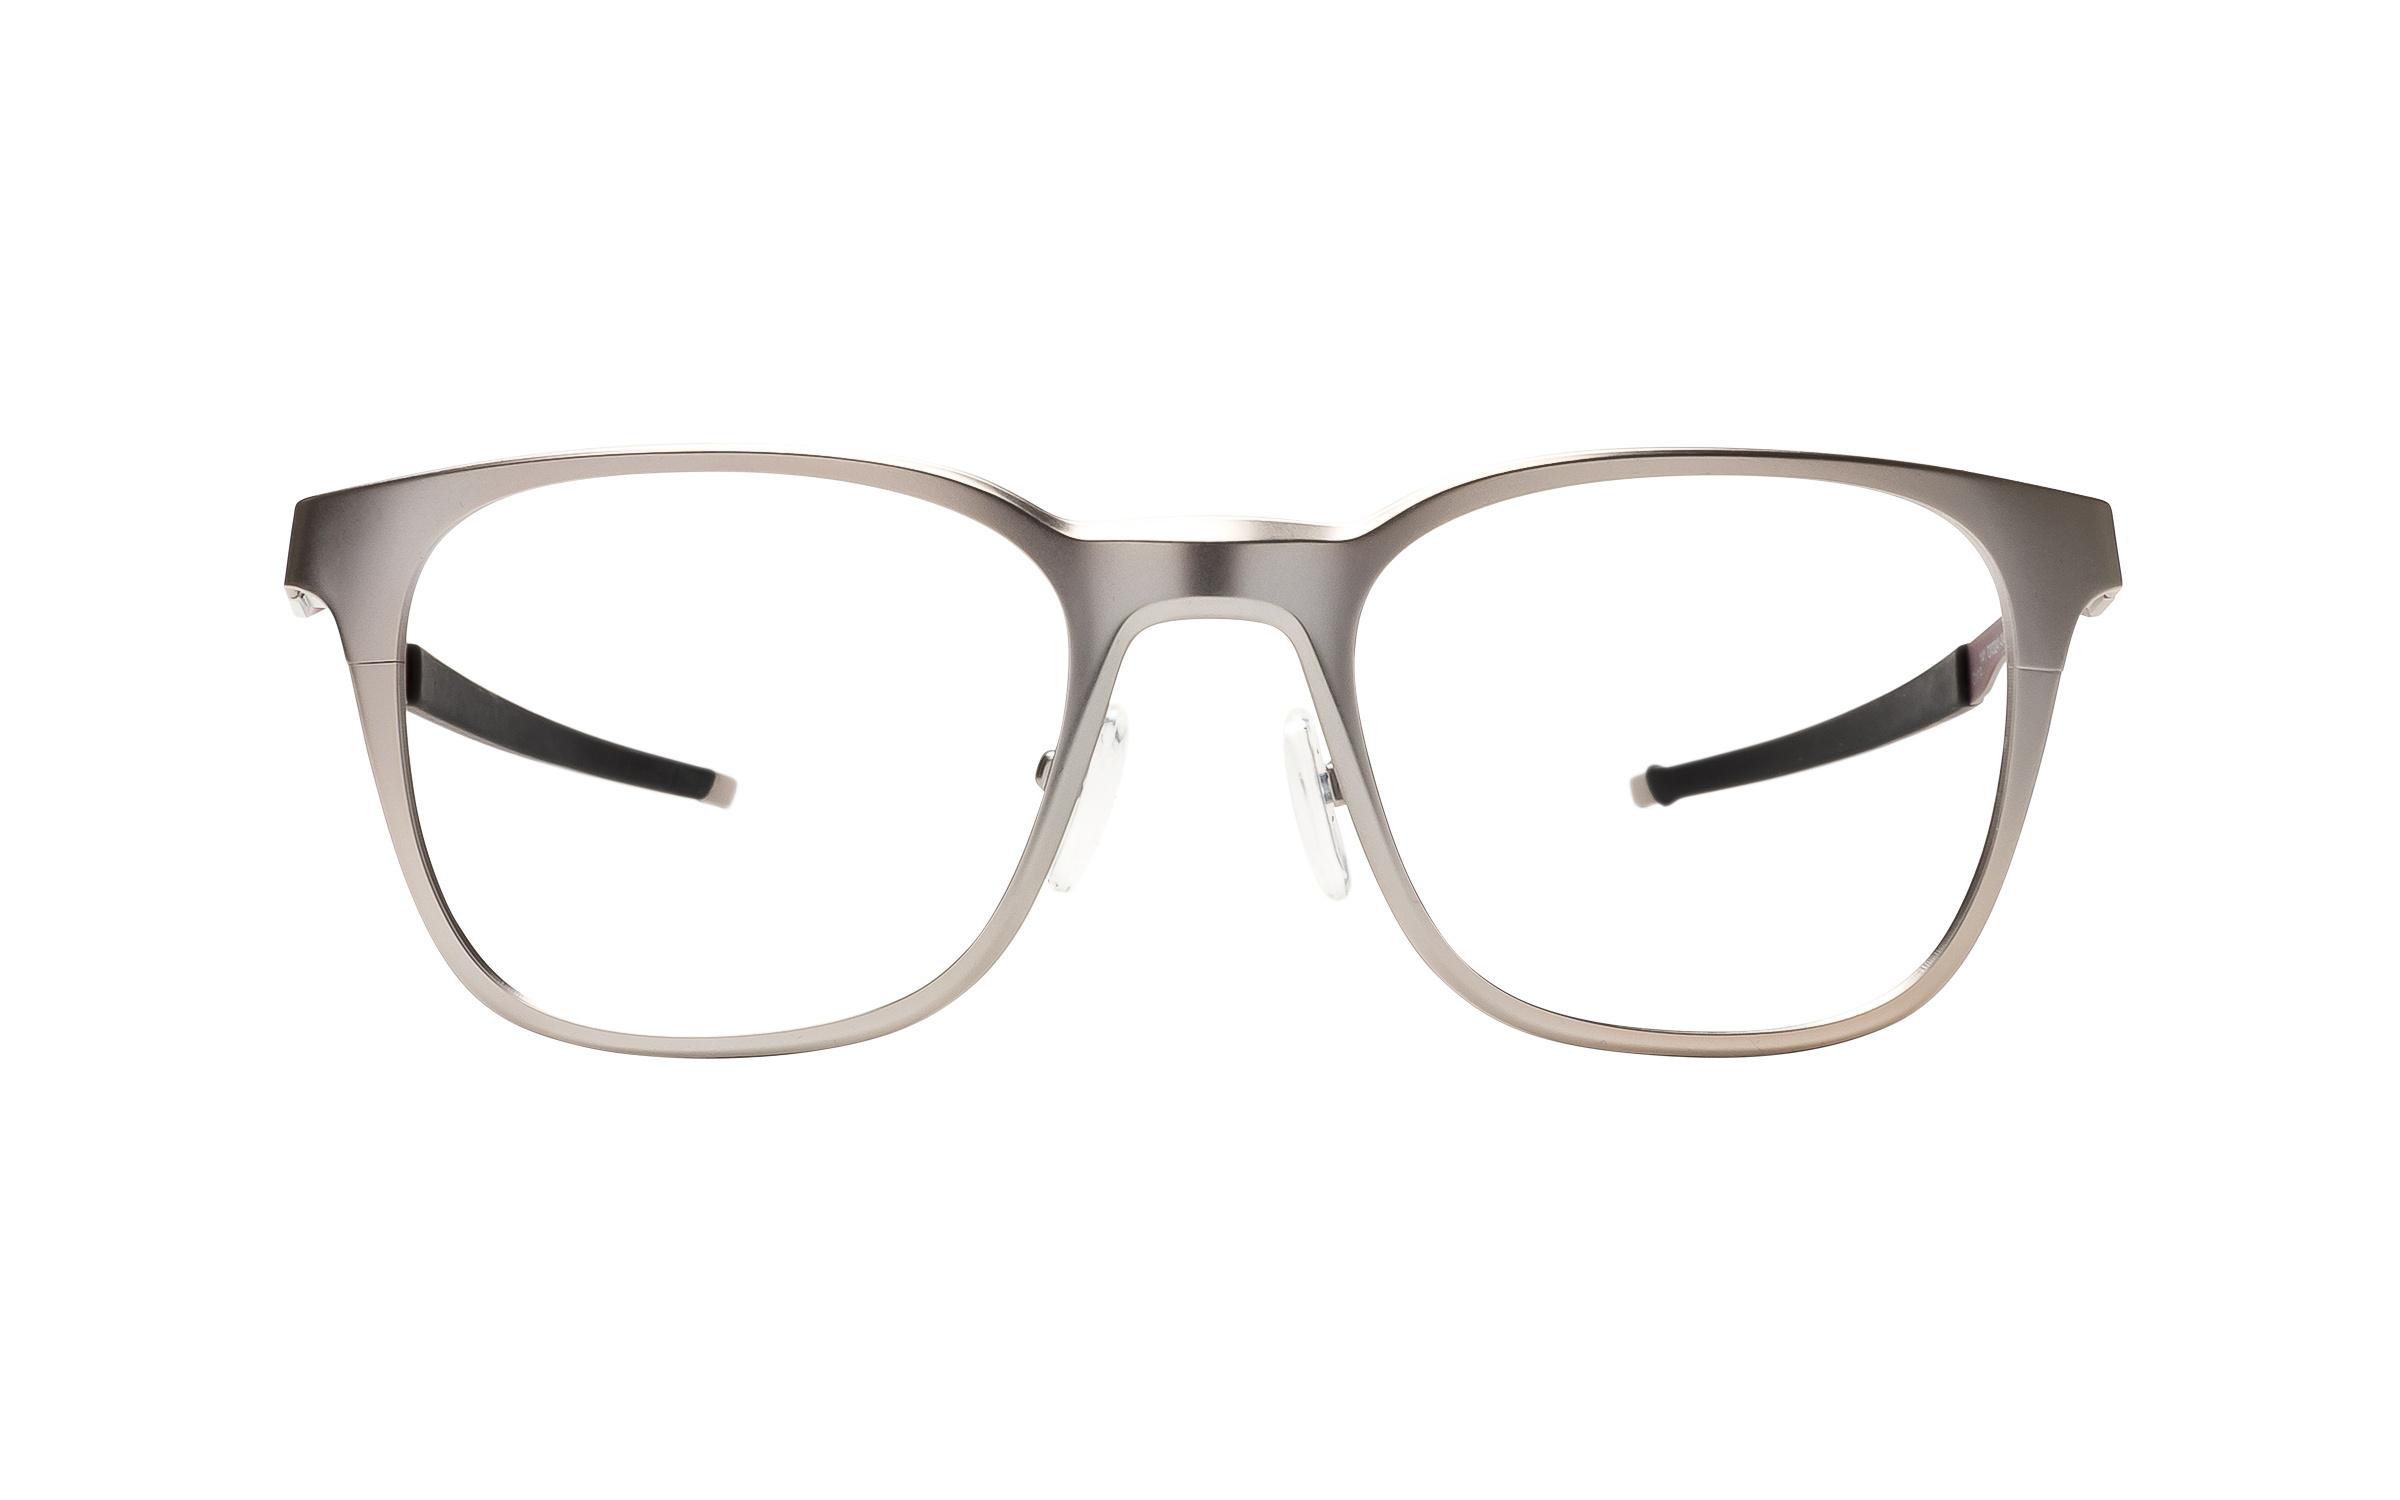 Luxottica Oakley Base Plane R OX3241 0449 (49) Eyeglasses and Frame in Satin Chrome Silver | Plastic/Metal - Online Coastal